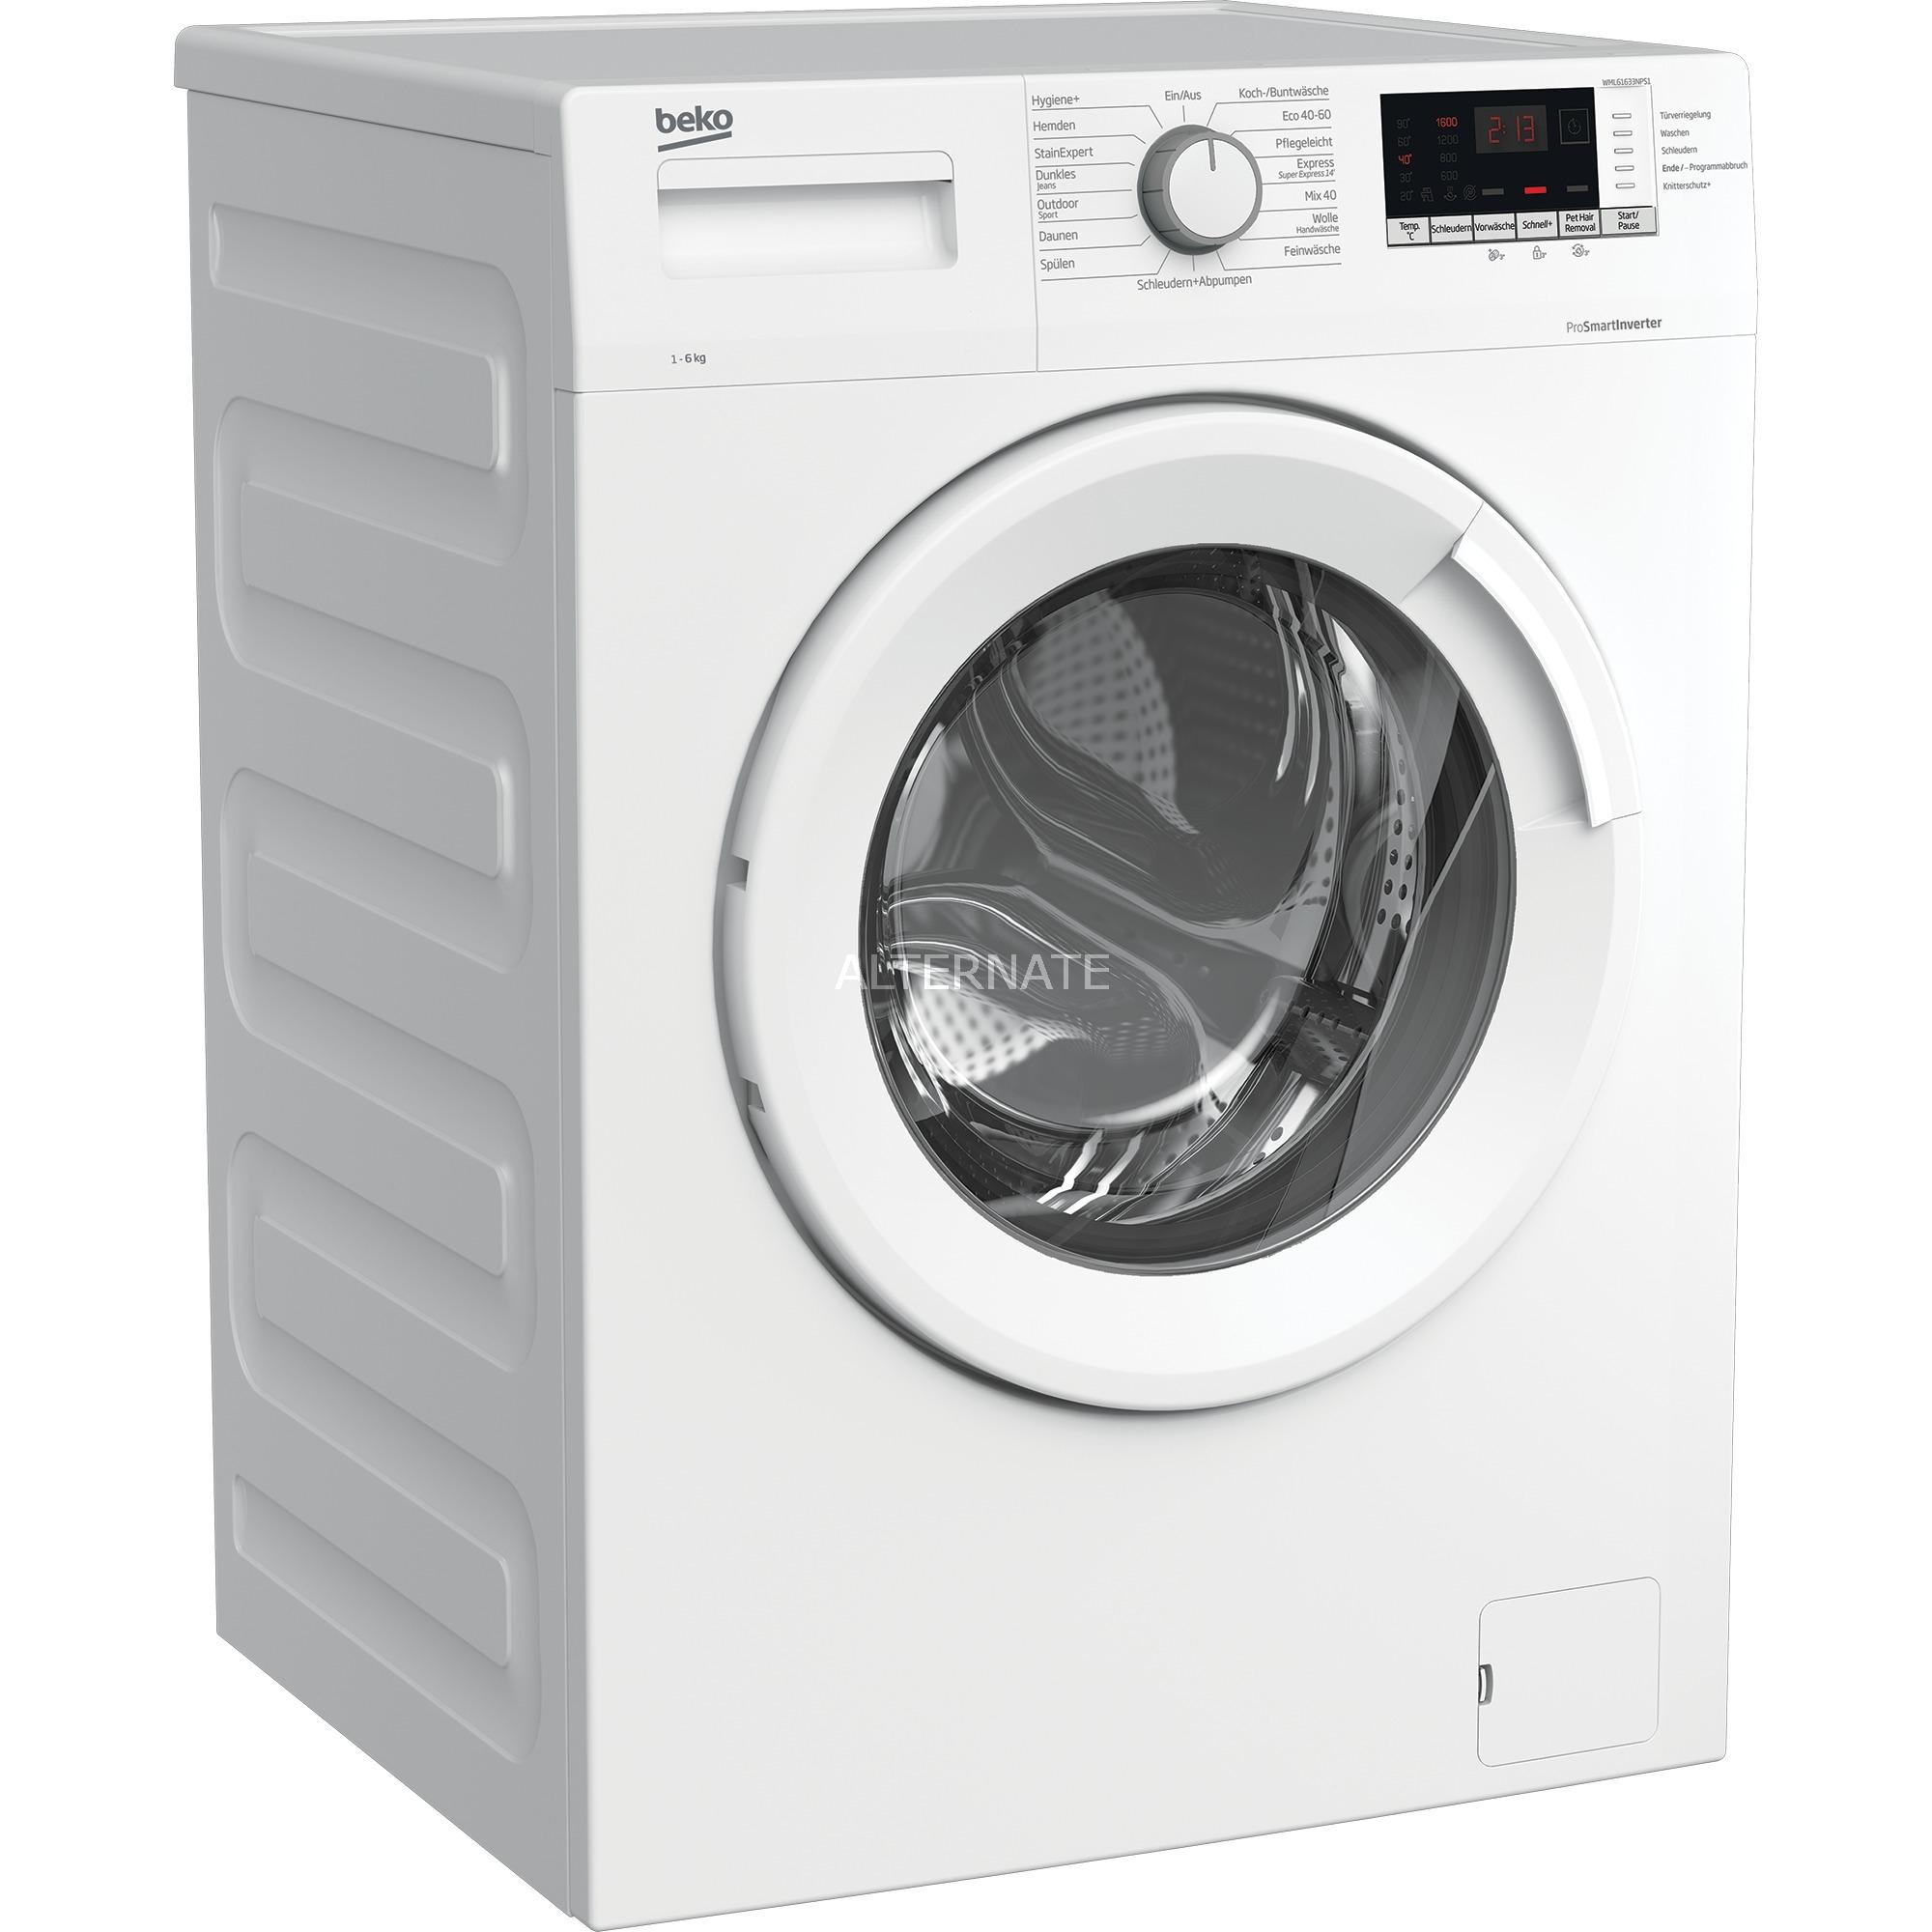 BEKO WML61633NPS1, Waschmaschine, 6Kg, 1600U/min